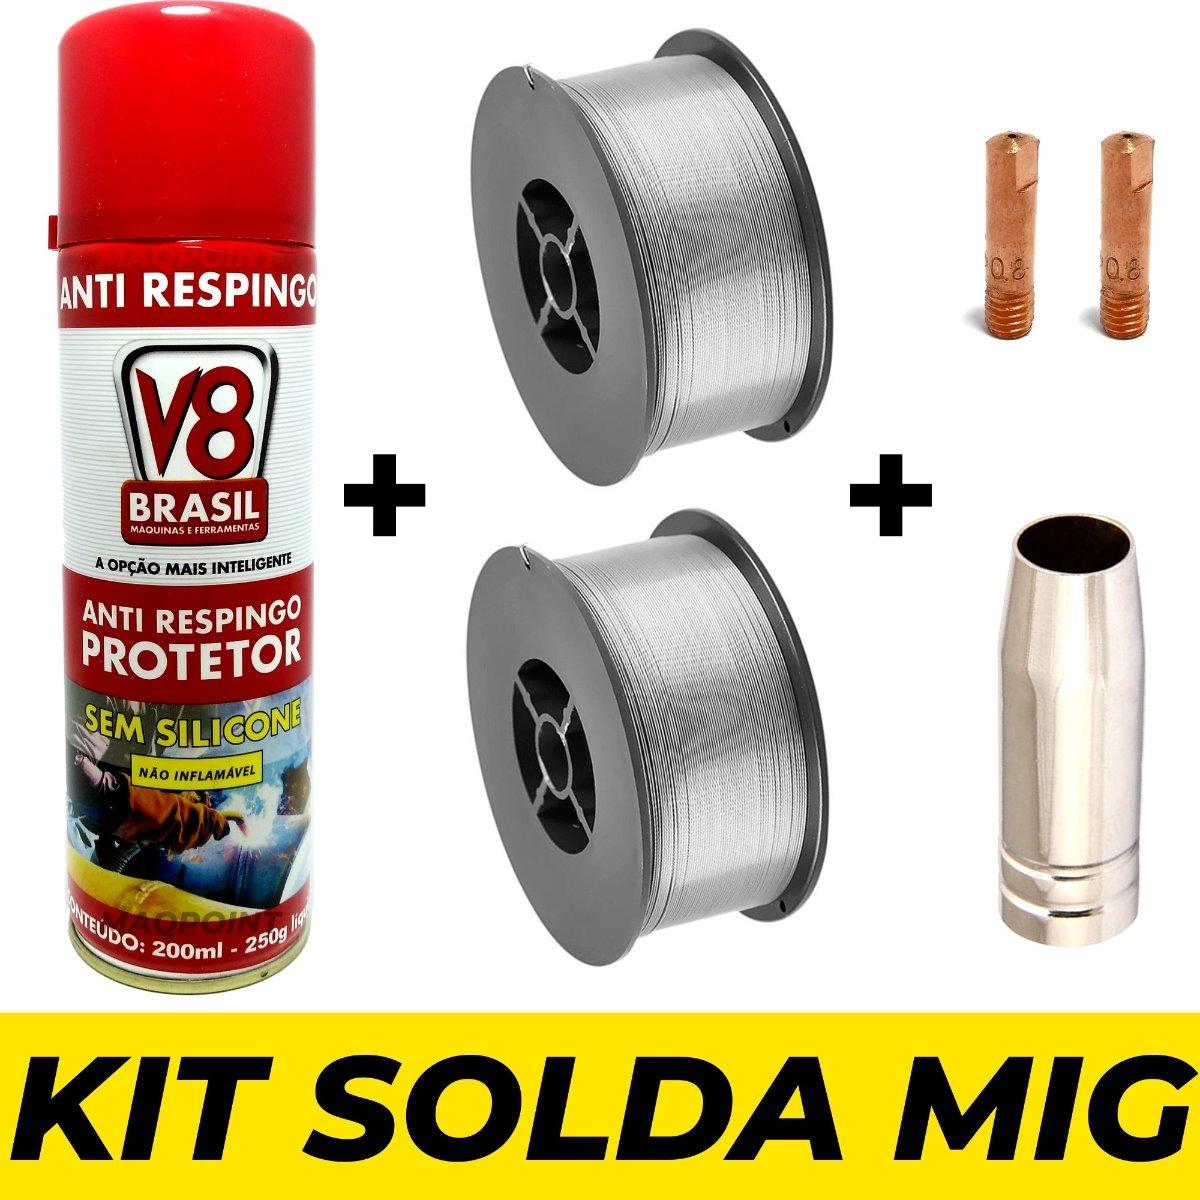 Kit Solda Mig Sem Gás - Anti Respingo Arame 0,8mm Bico Bocal - R ... 2c144fc59f